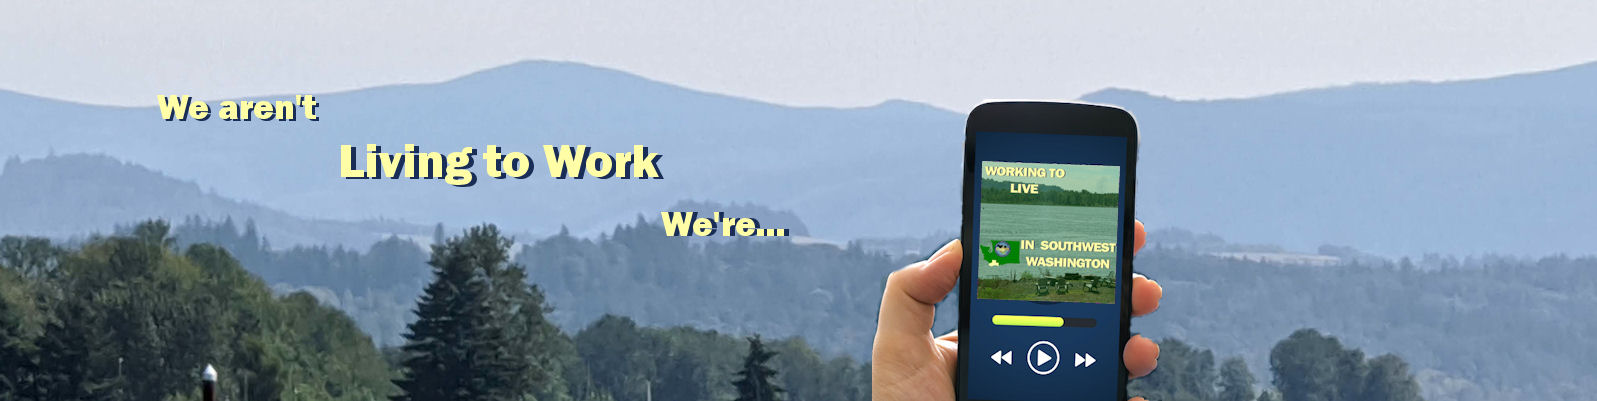 Working to Live in Southwest Washington